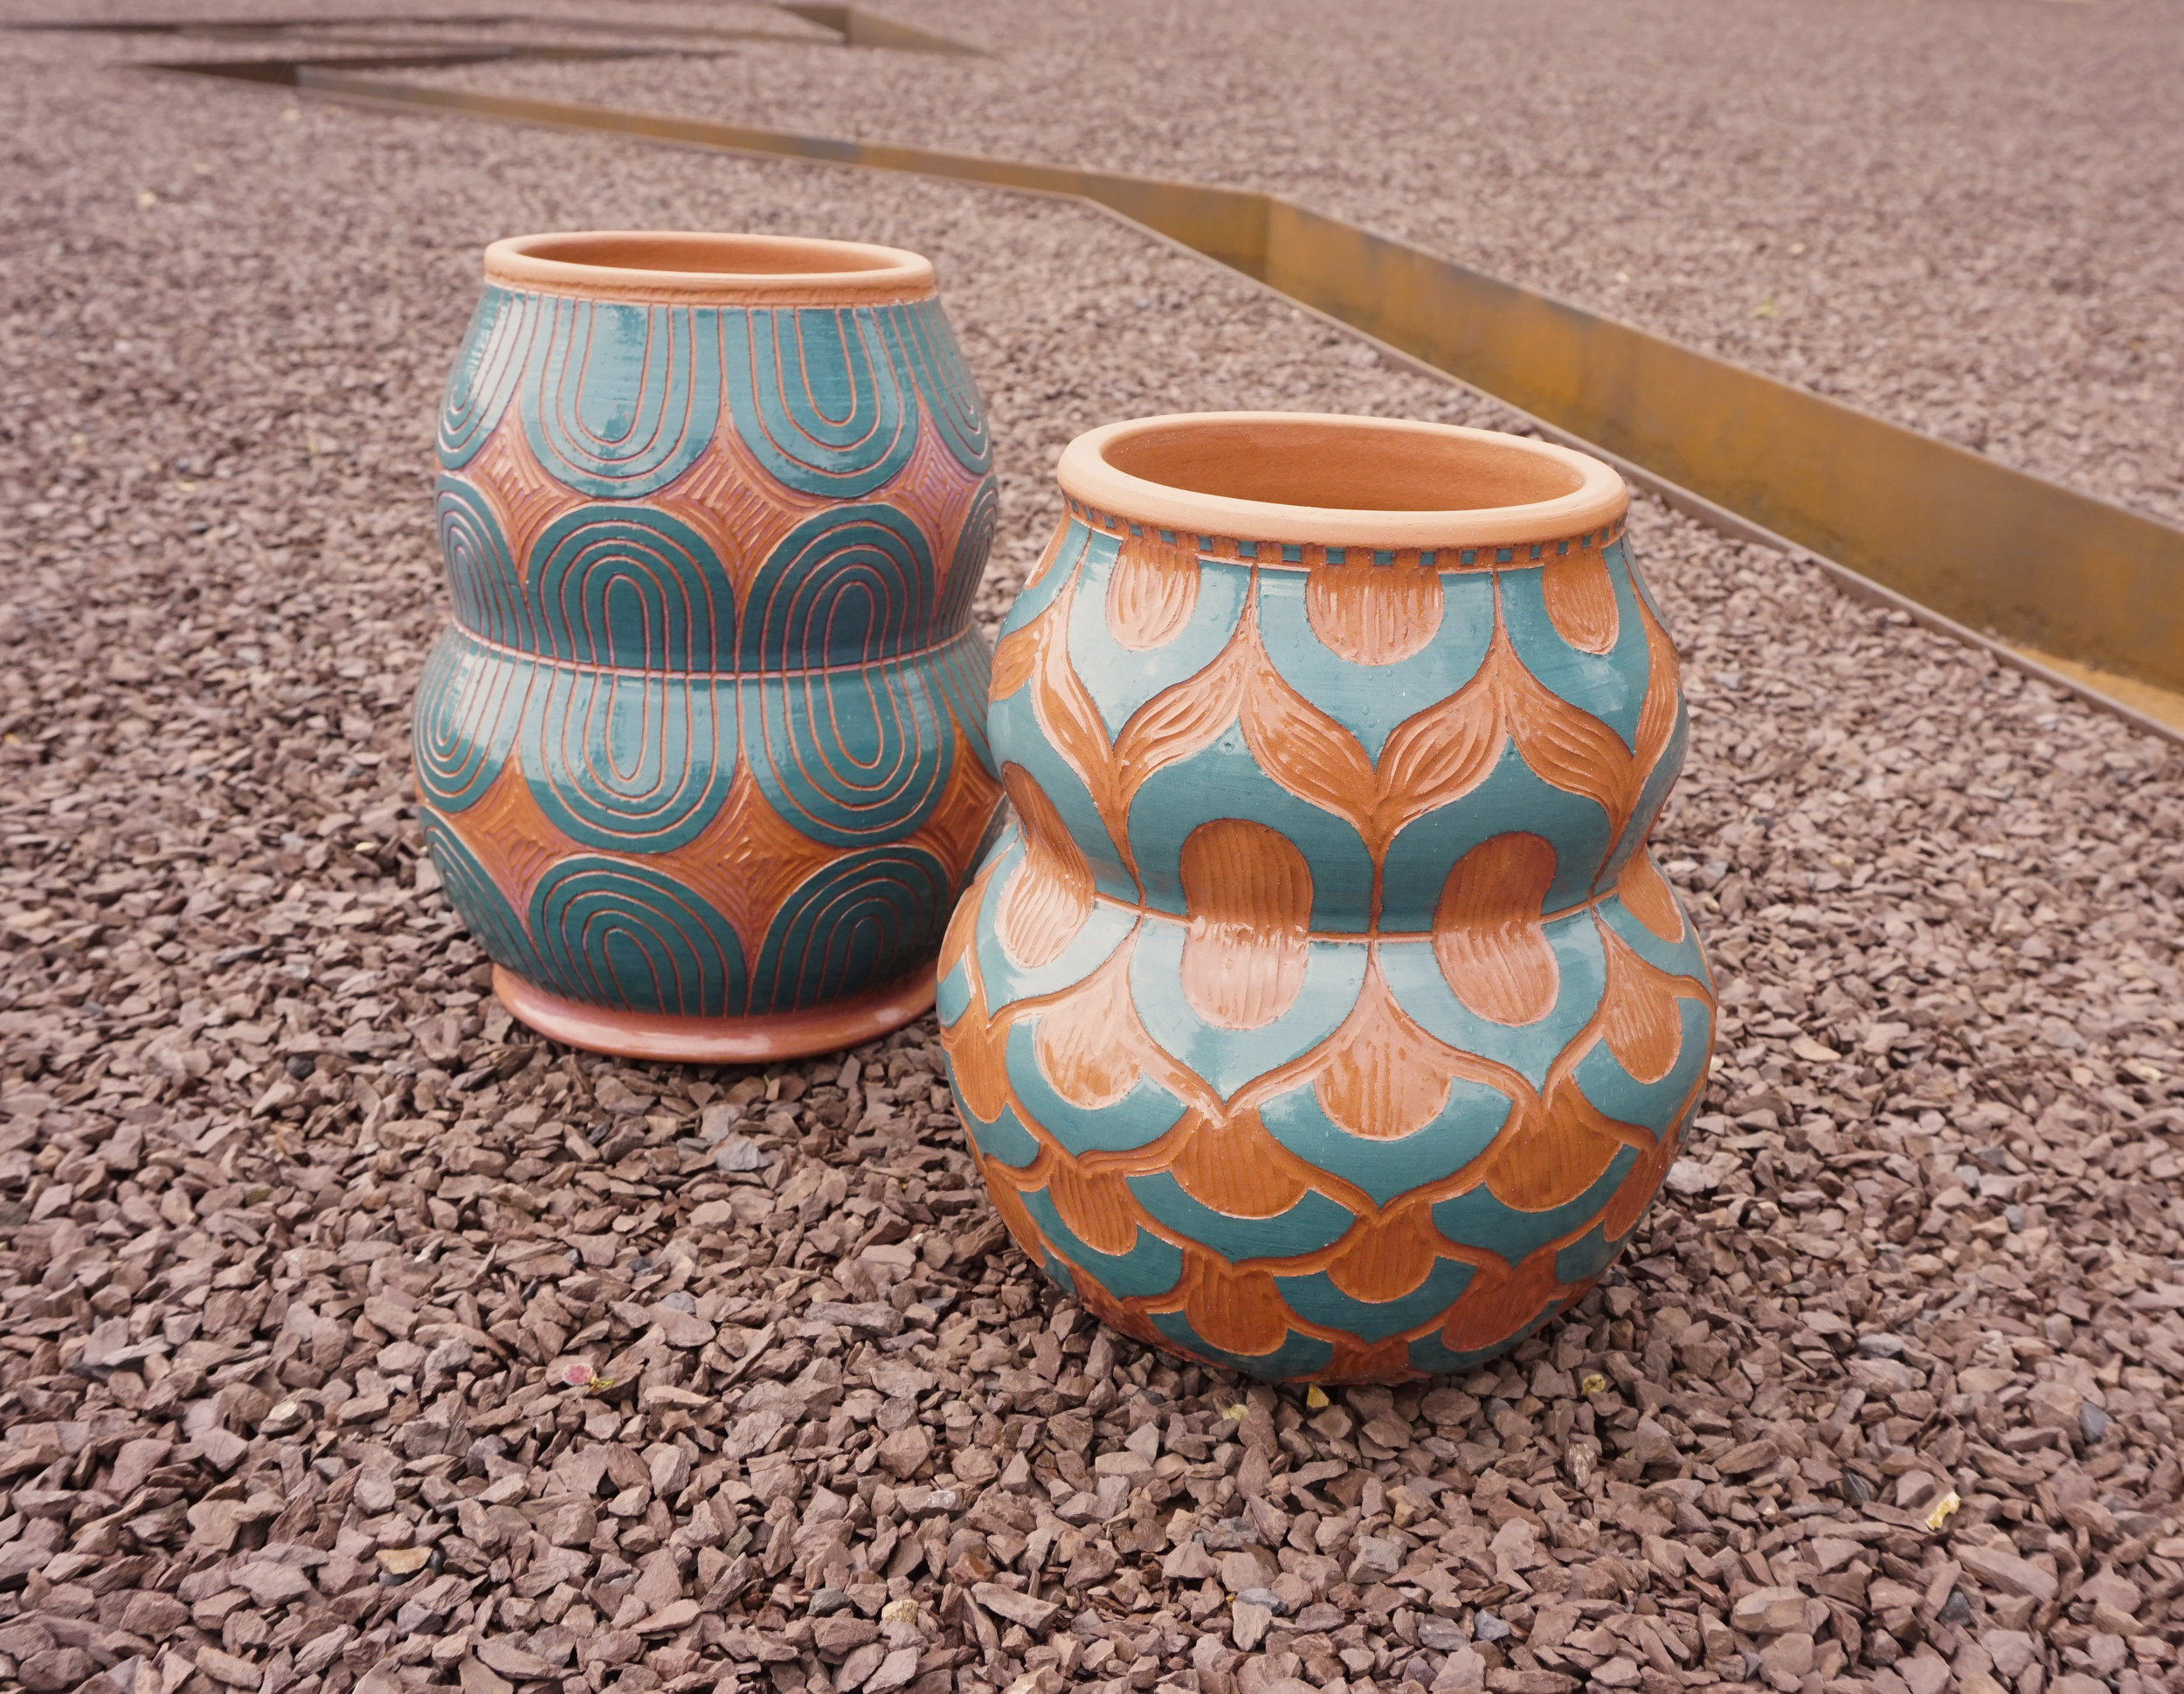 GABO MARTINEZ . FRONT:  Maceta de Petalos , 2019. Terracotta, slip, sgraffito. 9.5 x 7 x 7 inches. BACK:  Footed Petaled Planter,  2019. Terracotta, slip, sgraffito. 10.5 x 7 x 7 inches.